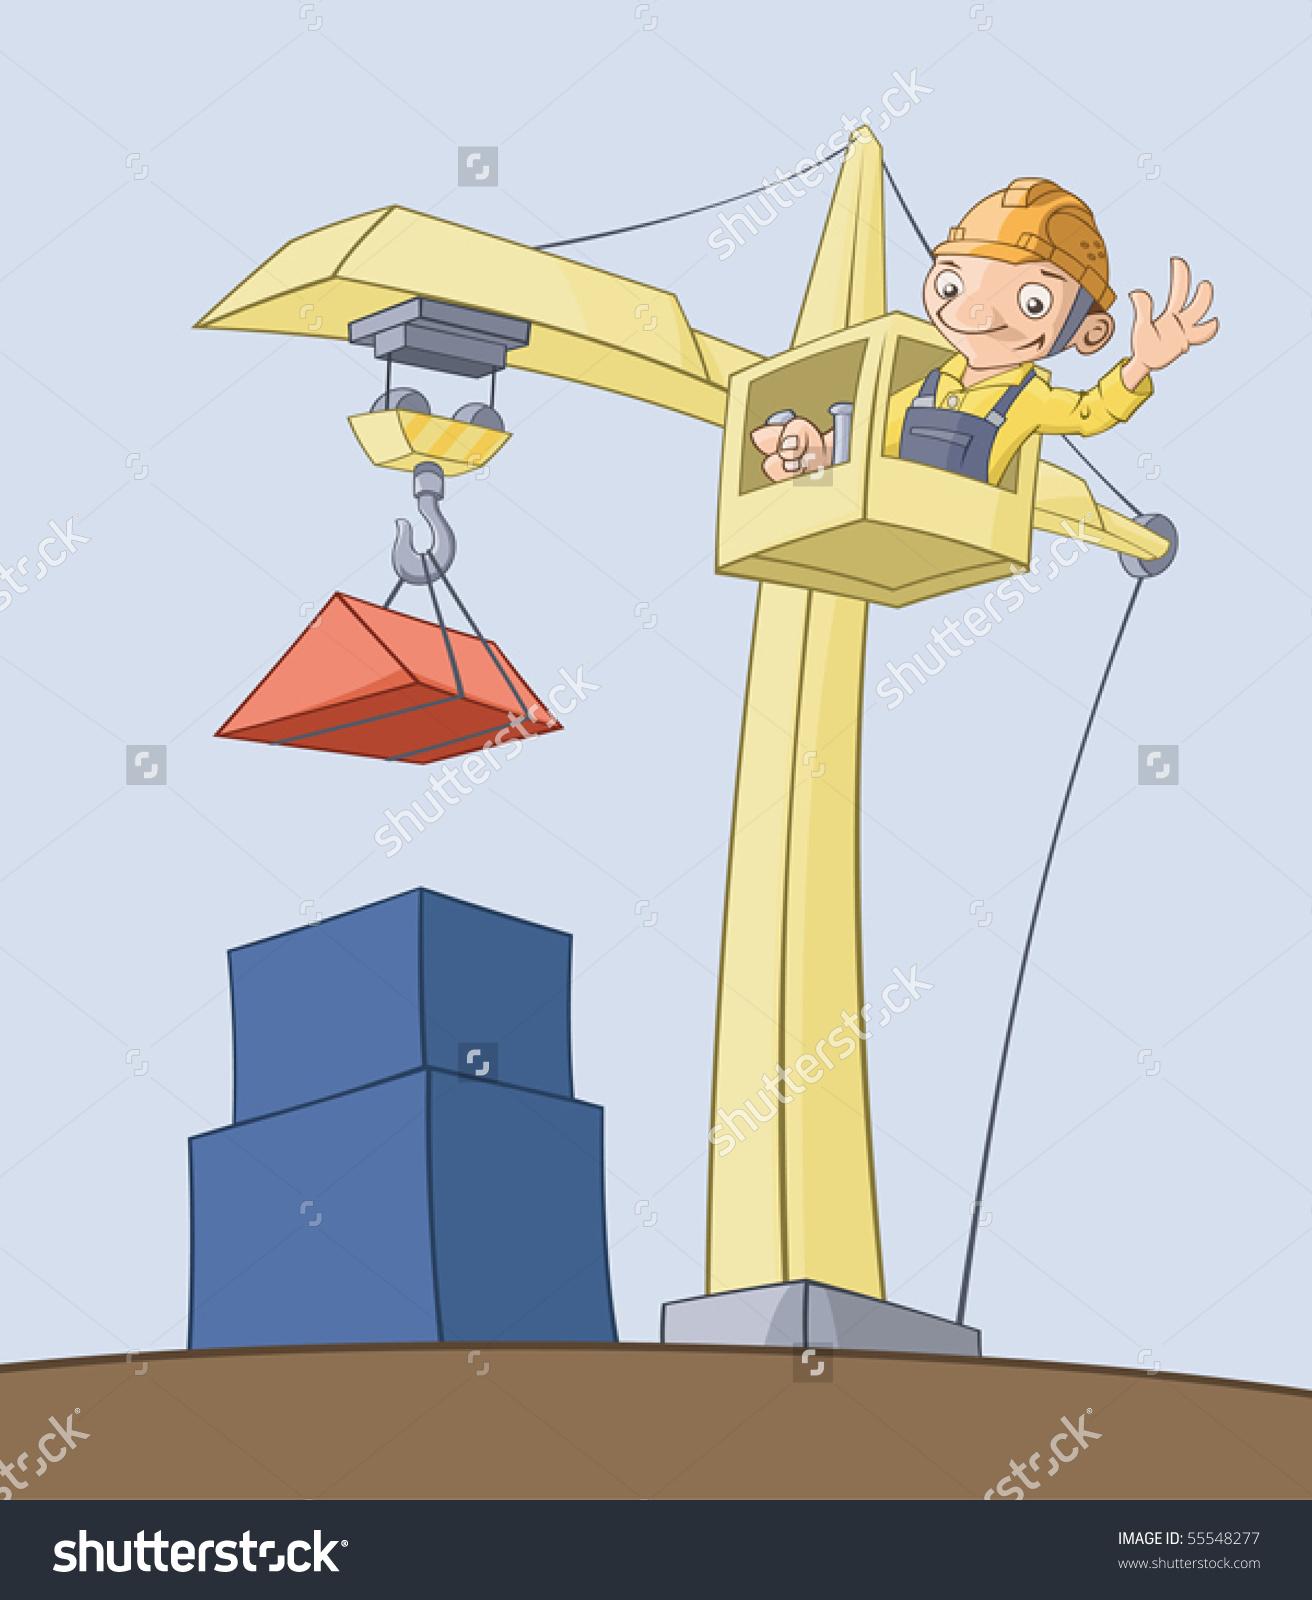 Worker On Crane Lifts Cargo Stock Vector 55548277.